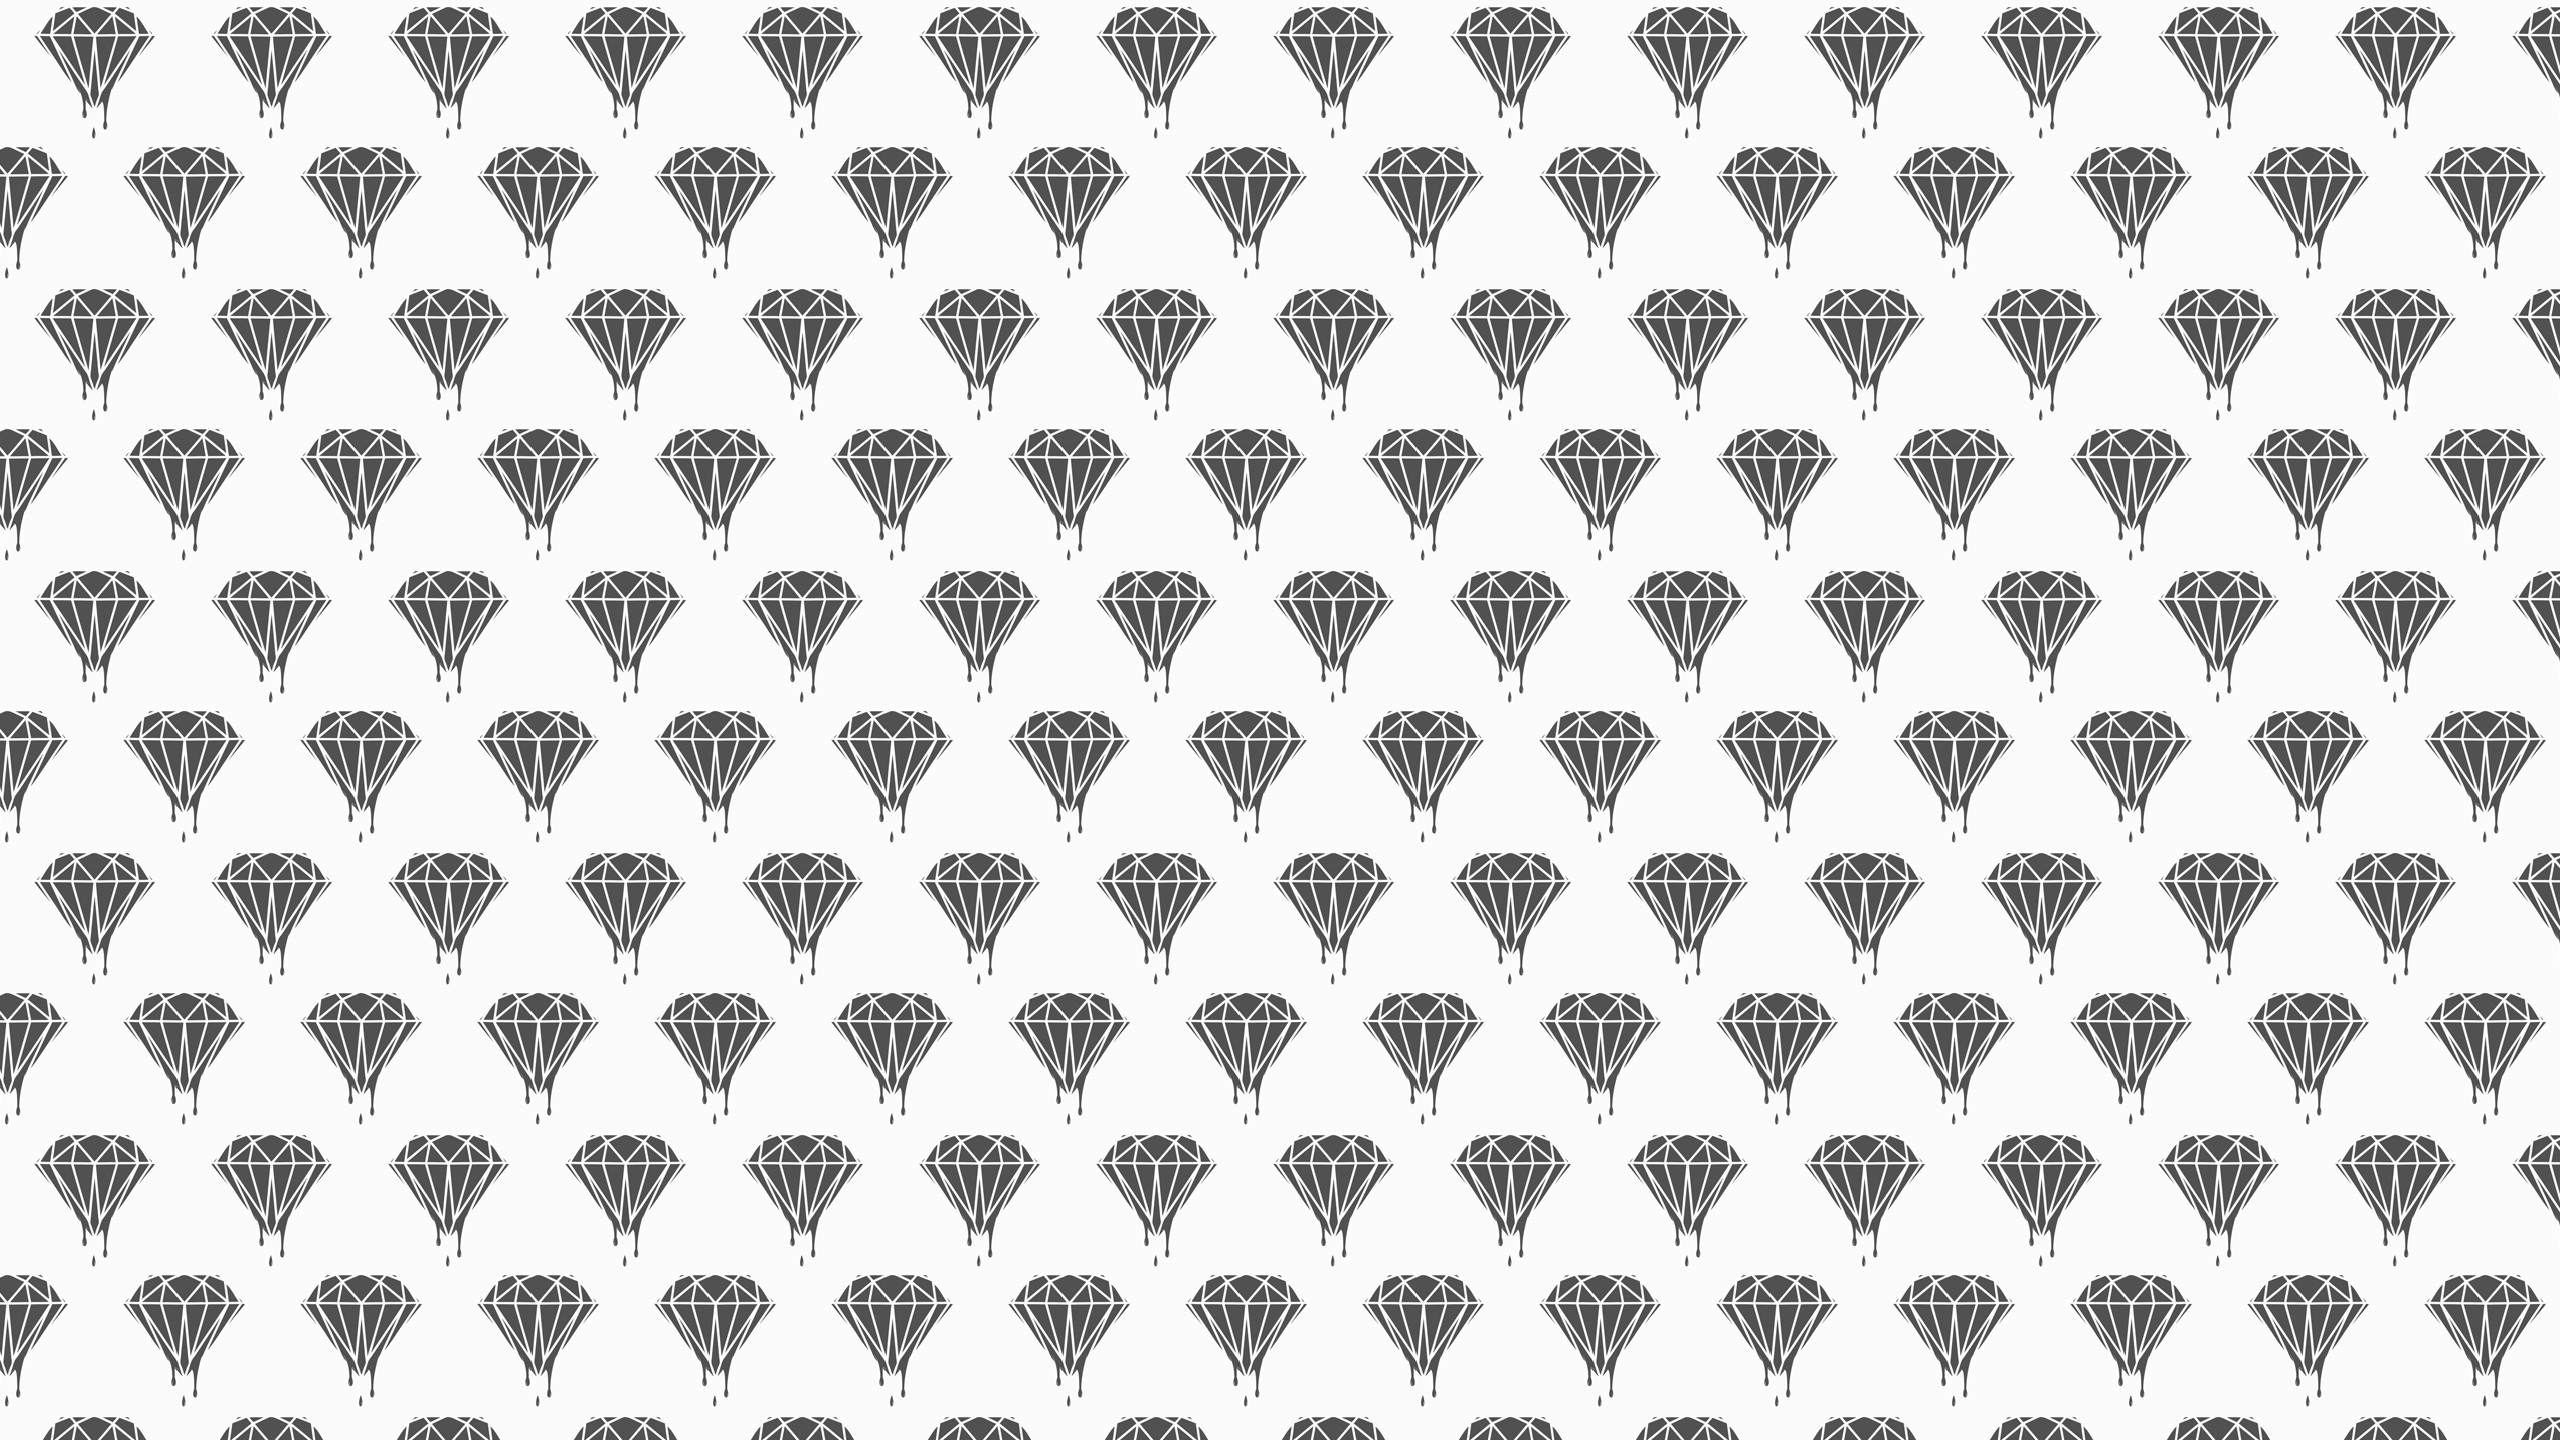 diamonds background tumblr - photo #36